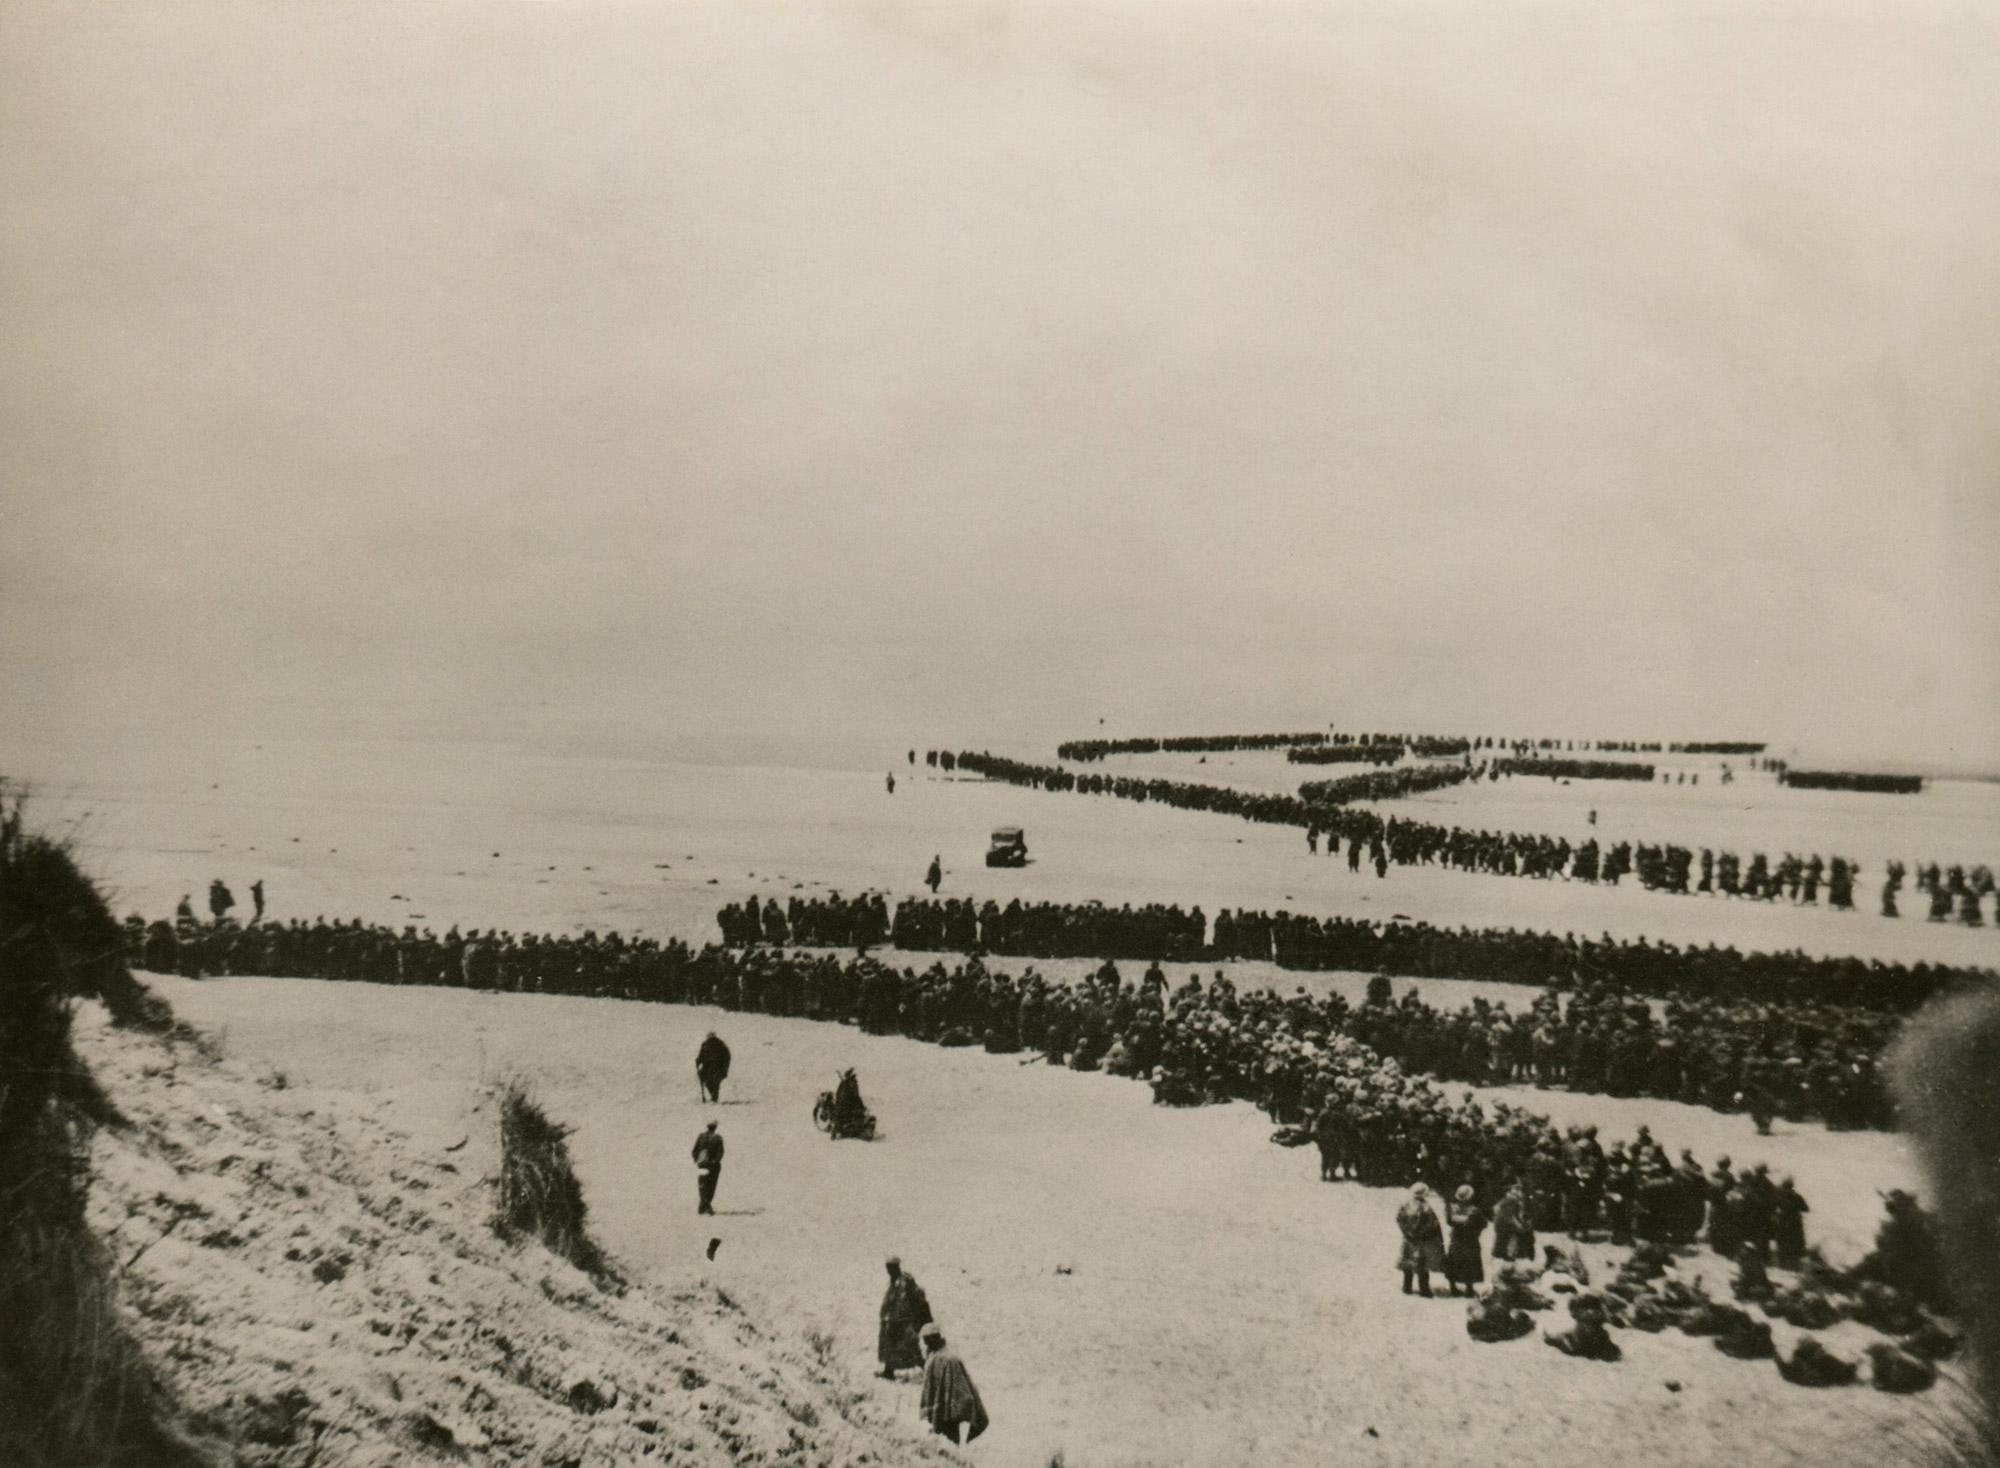 Image military-evacuation-dunkirk-during-world-war